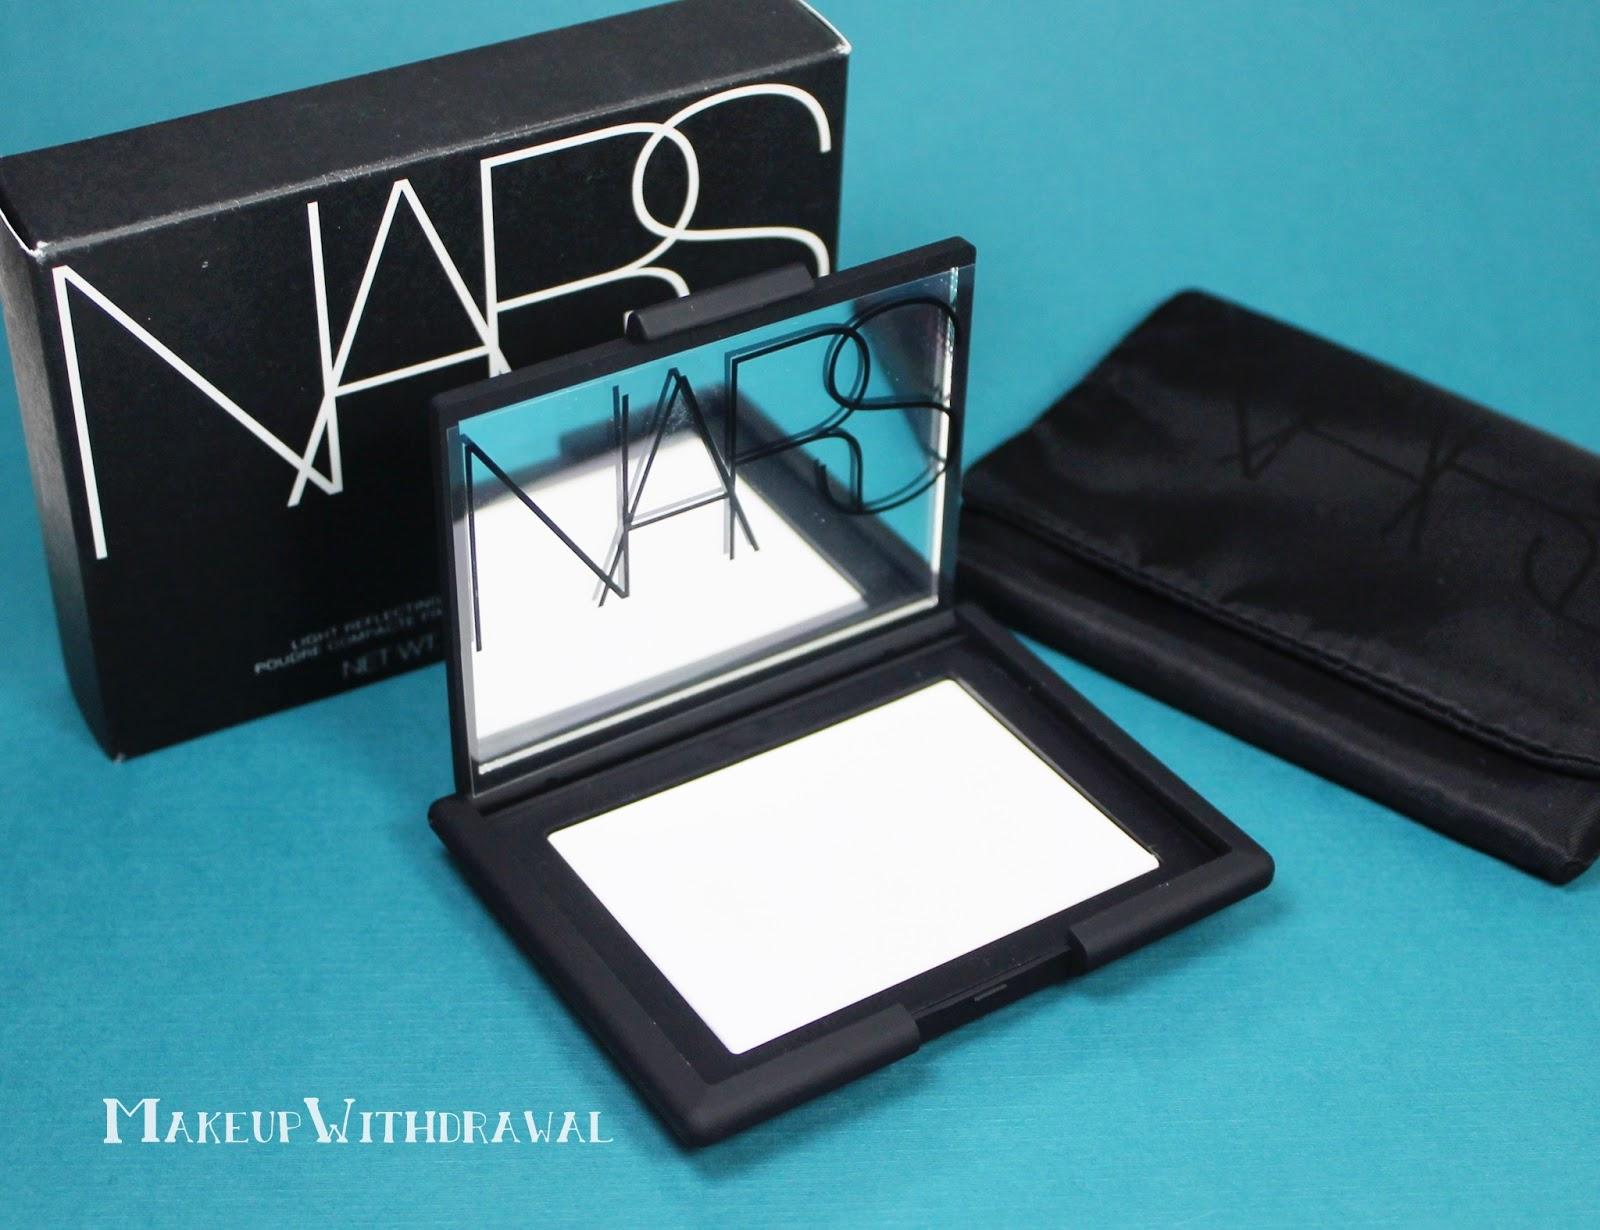 review nars light reflecting pressed powder makeup. Black Bedroom Furniture Sets. Home Design Ideas